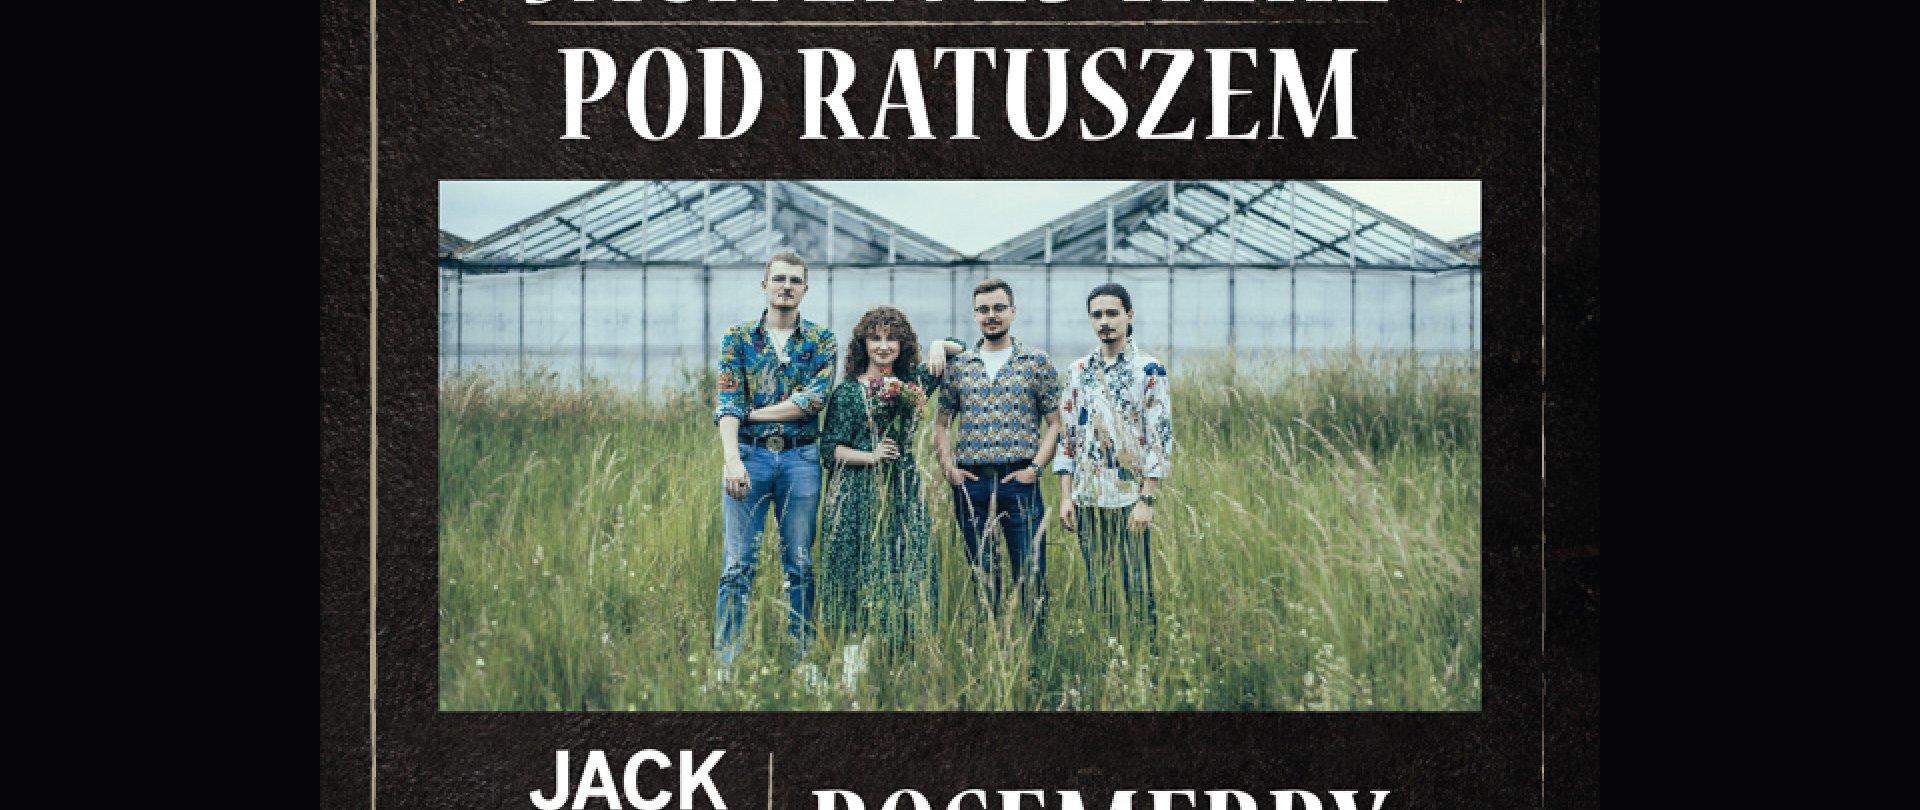 RoseMerry - LJH pod Ratuszem